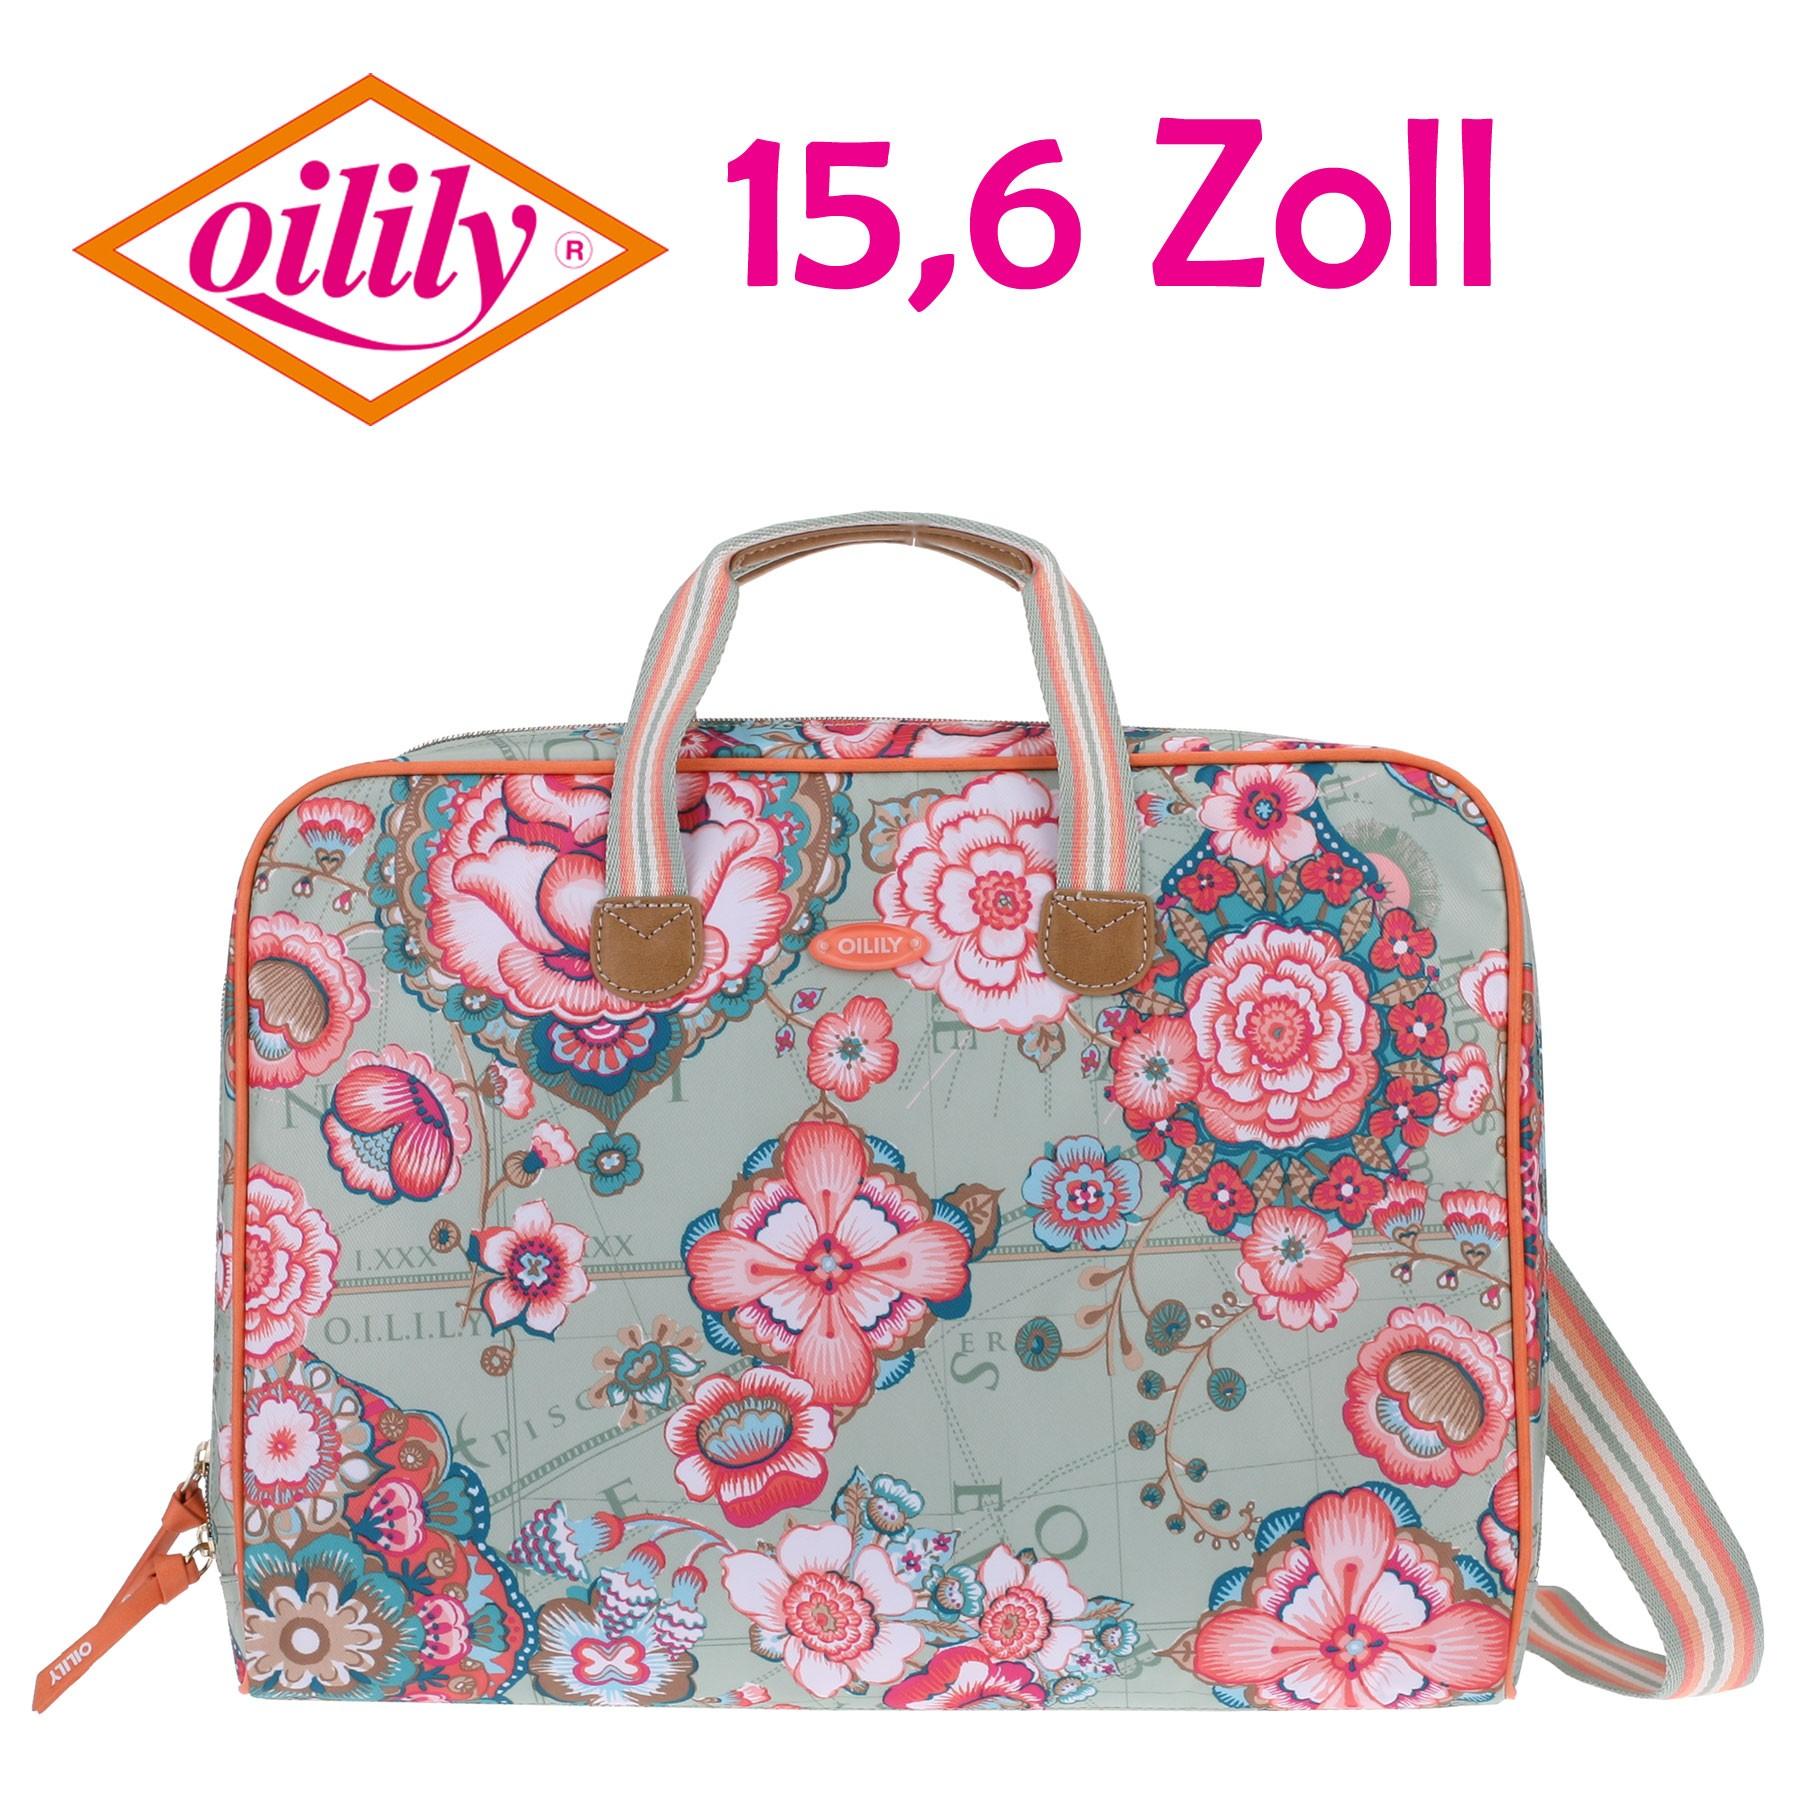 oilily laptoptasche laptop bag 15 6 zoll fantasy flora. Black Bedroom Furniture Sets. Home Design Ideas